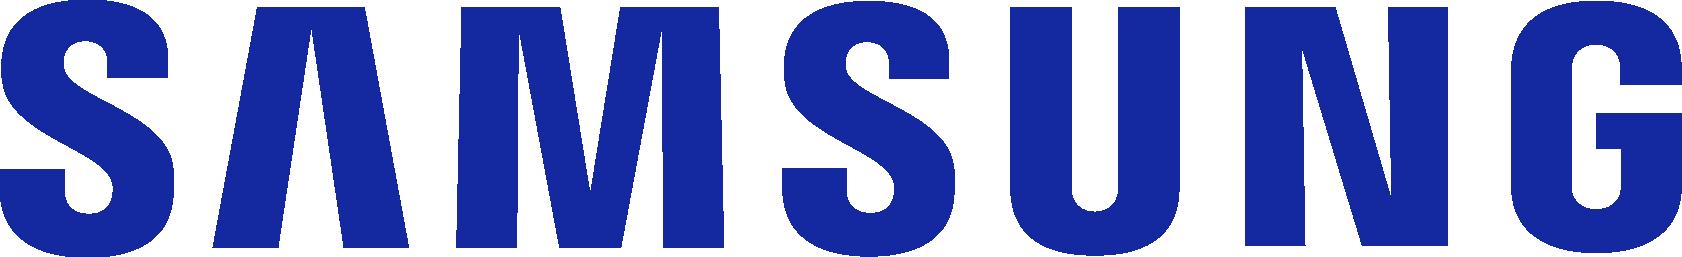 Samsung_blue